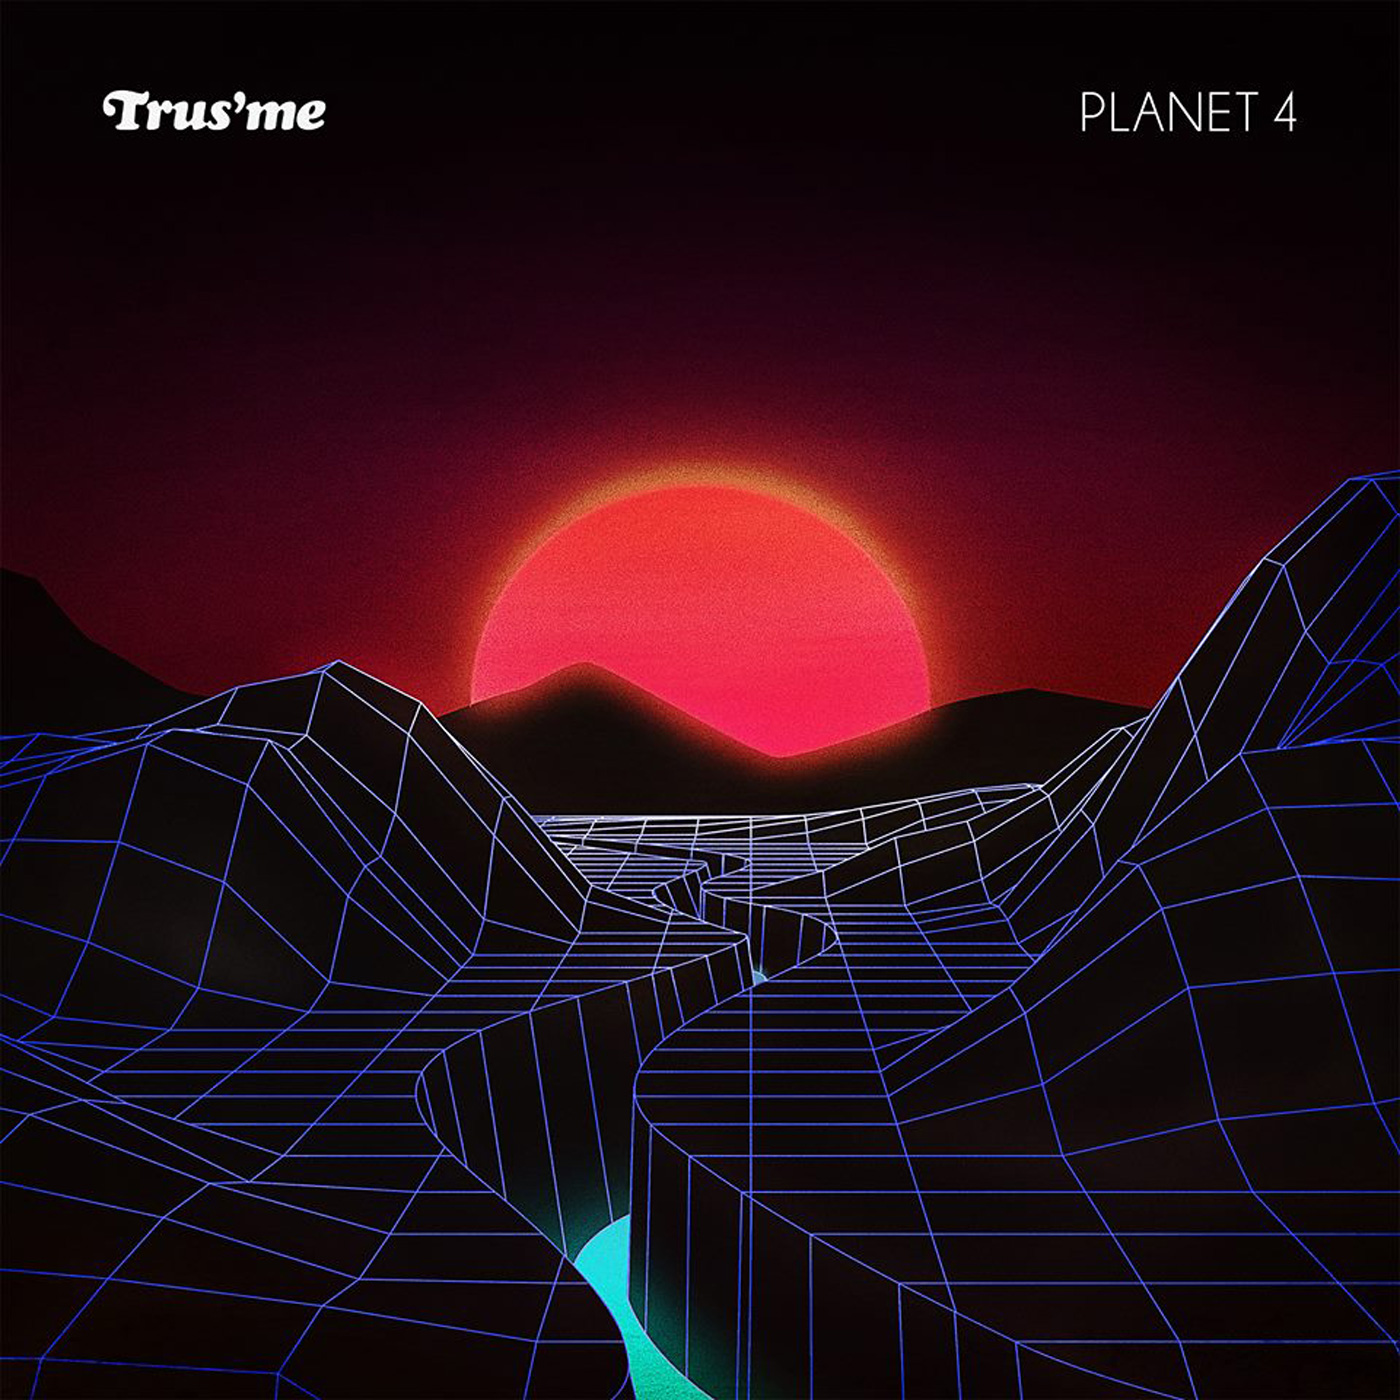 Album of the Week: Trus'me – Planet 4